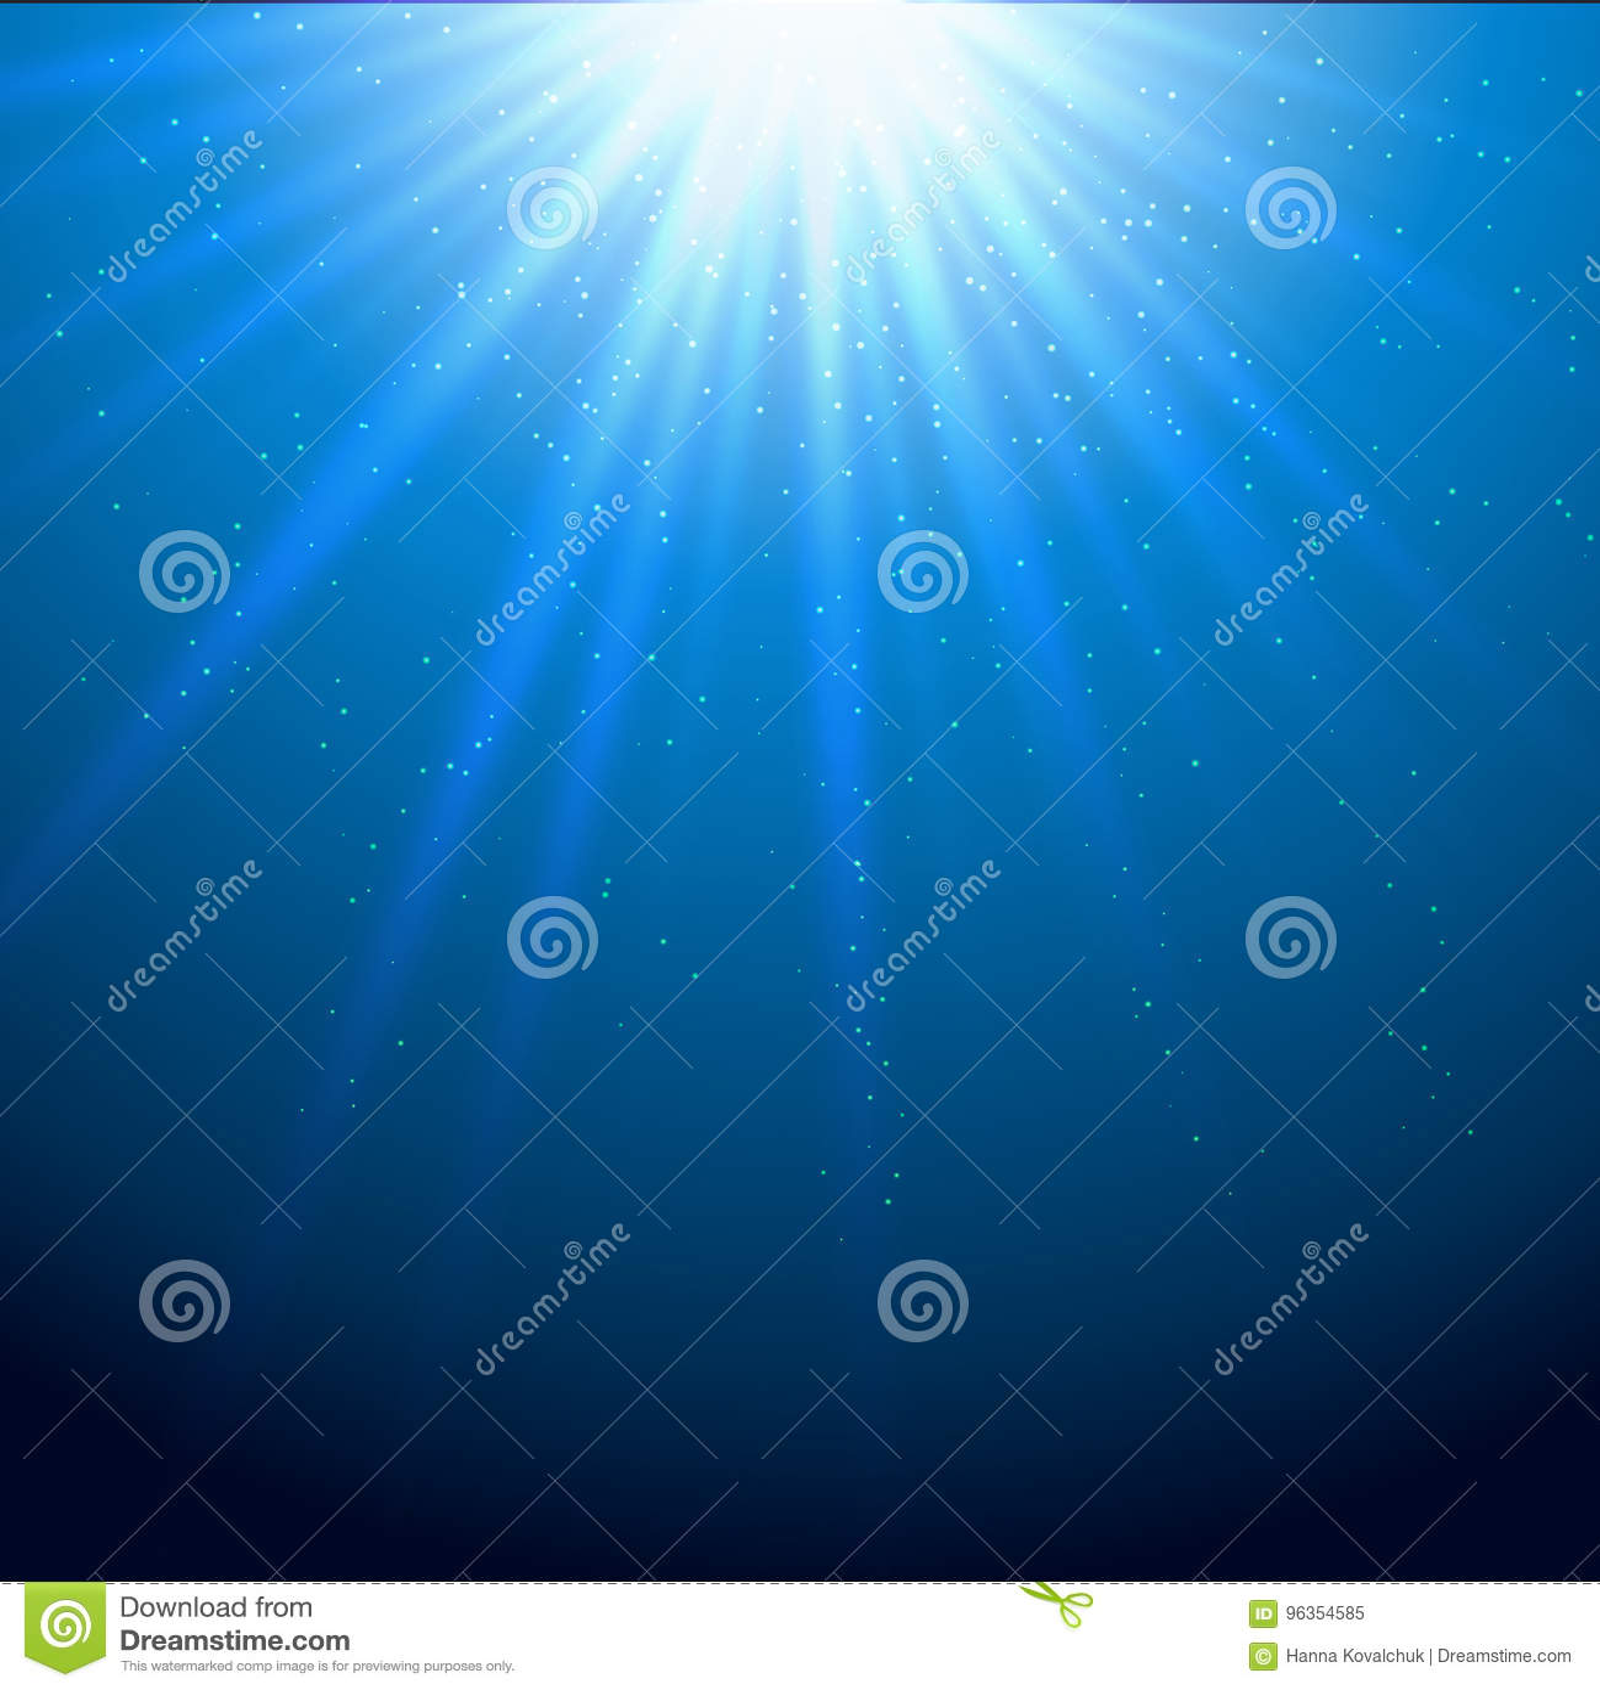 Fond bleu de scintillement de faisceaux lumineux